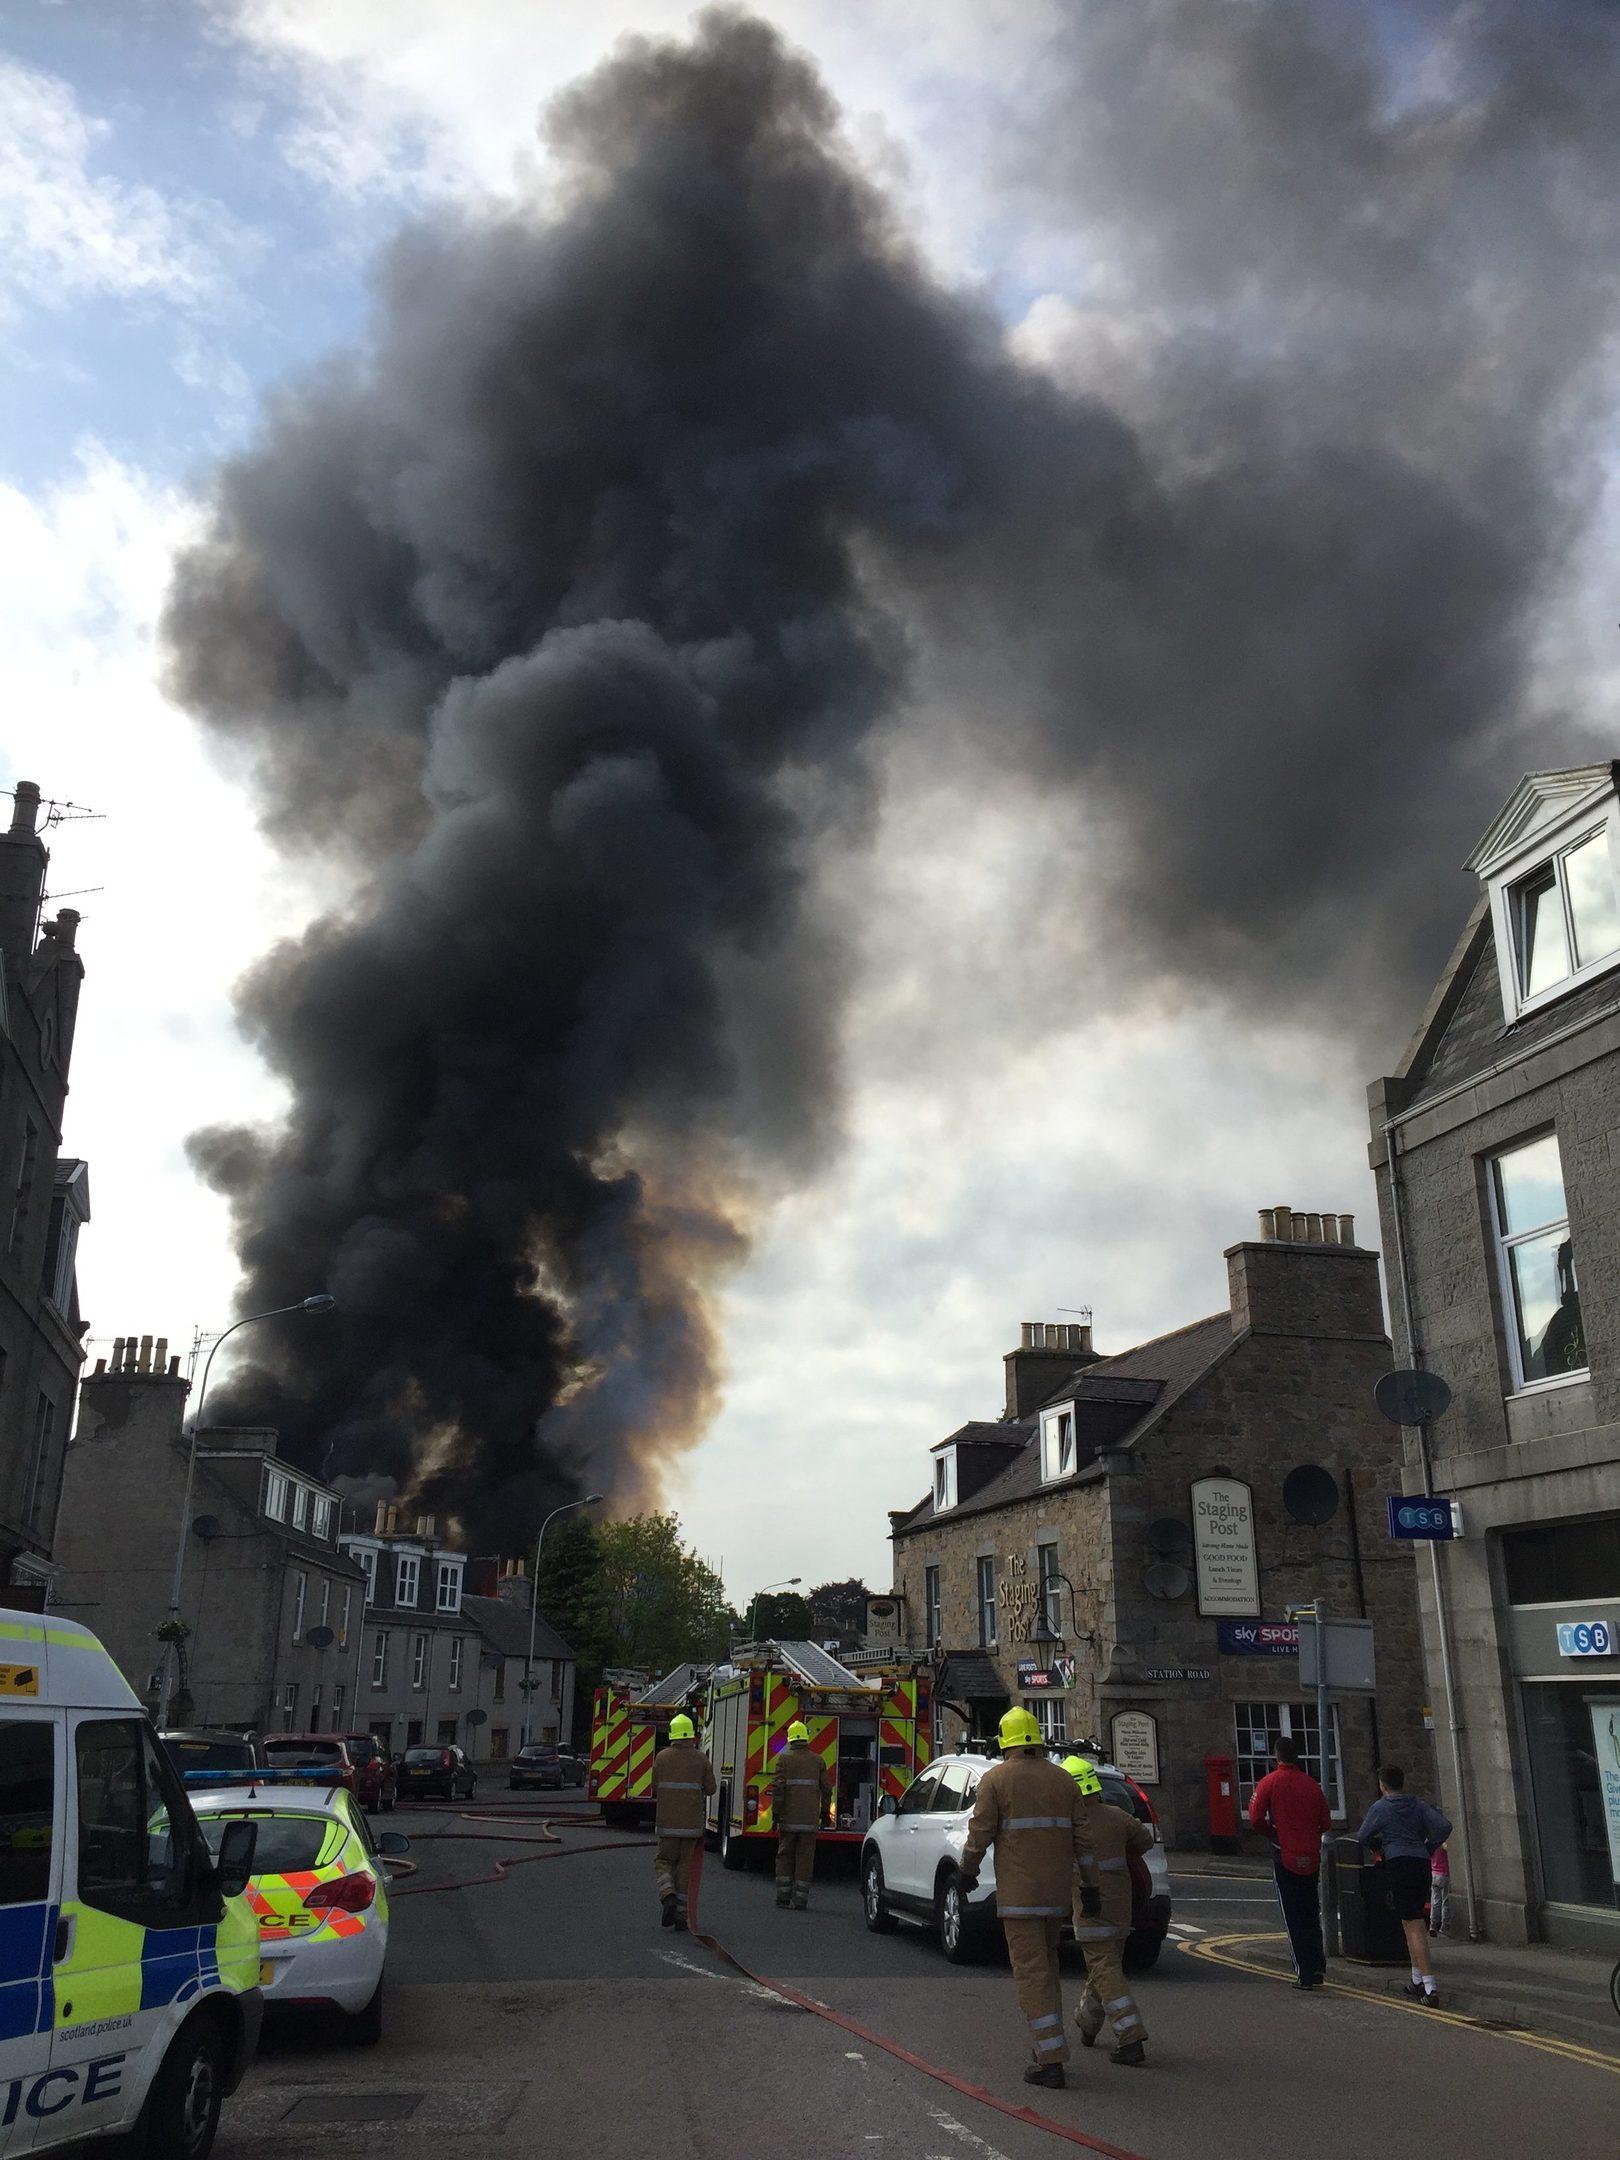 Smoke rises high above the hotel. Joanne Warnock